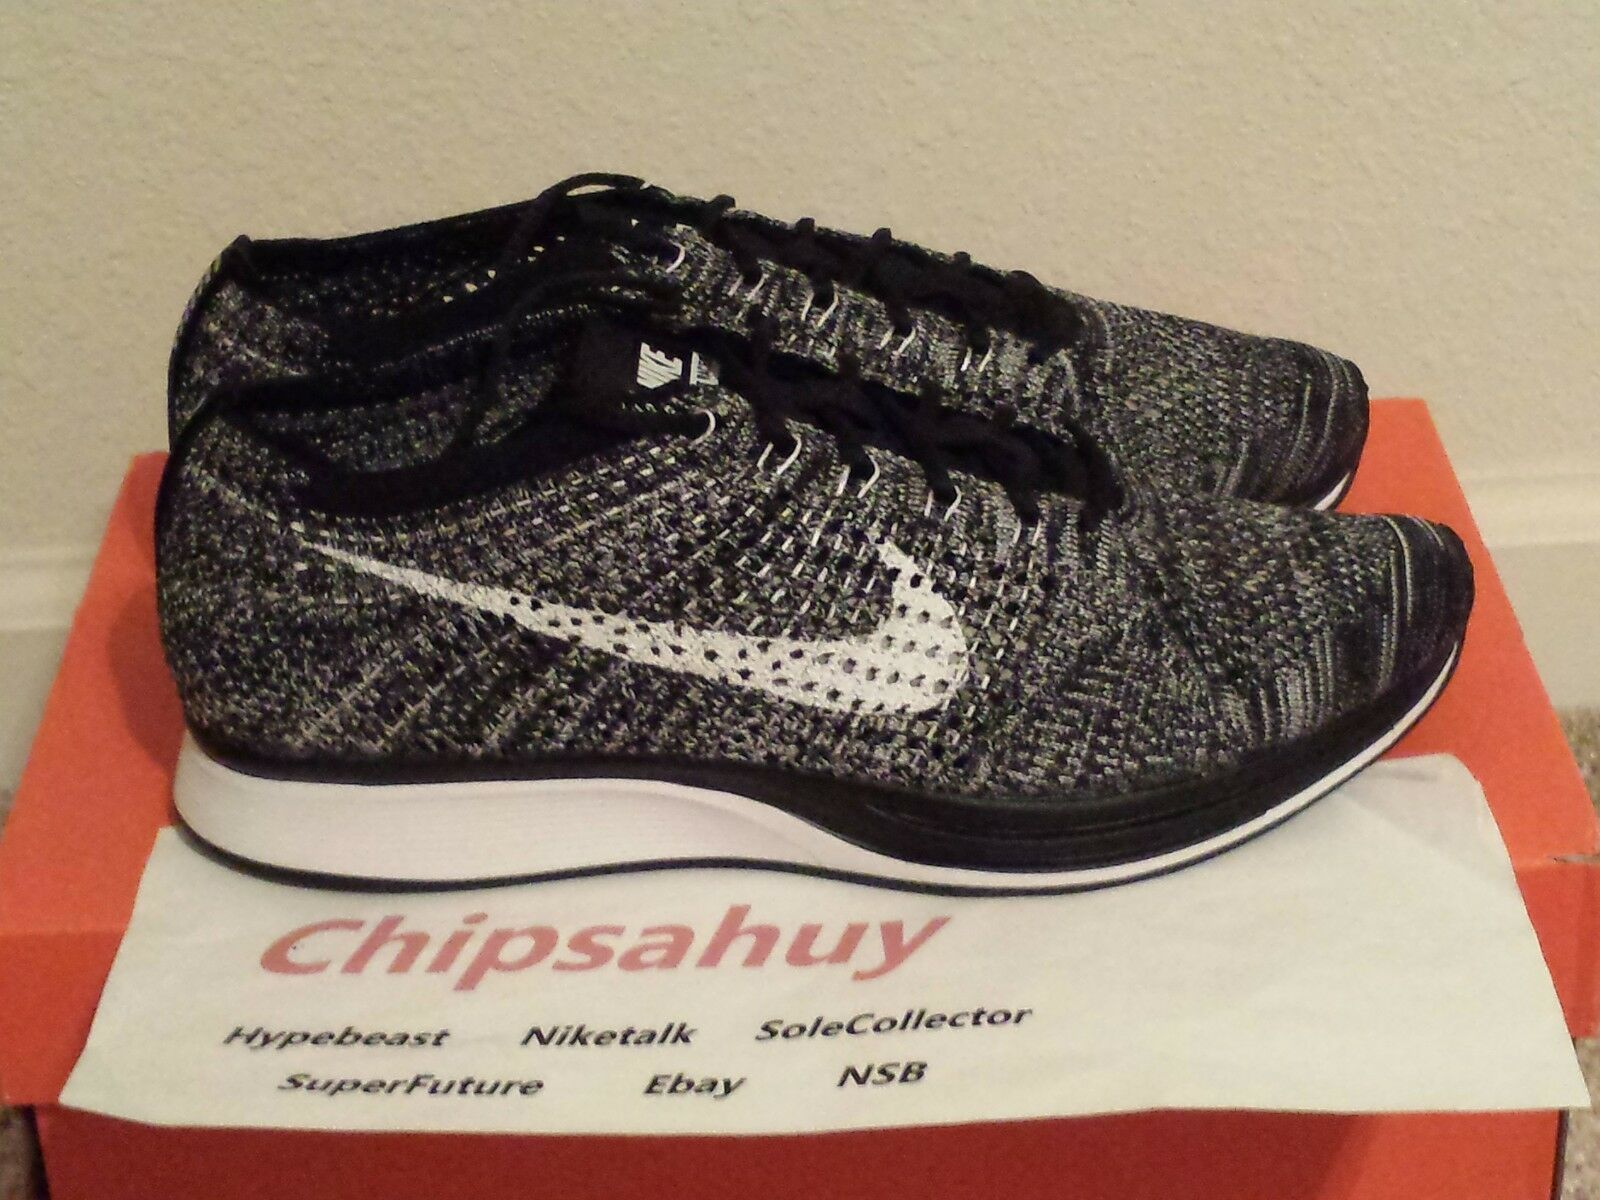 Nike Flyknit Racer Oreo Grey 2.0 Grey Oreo White Black Zoom Air Trainer Shoe DS Size 8.5 400c28